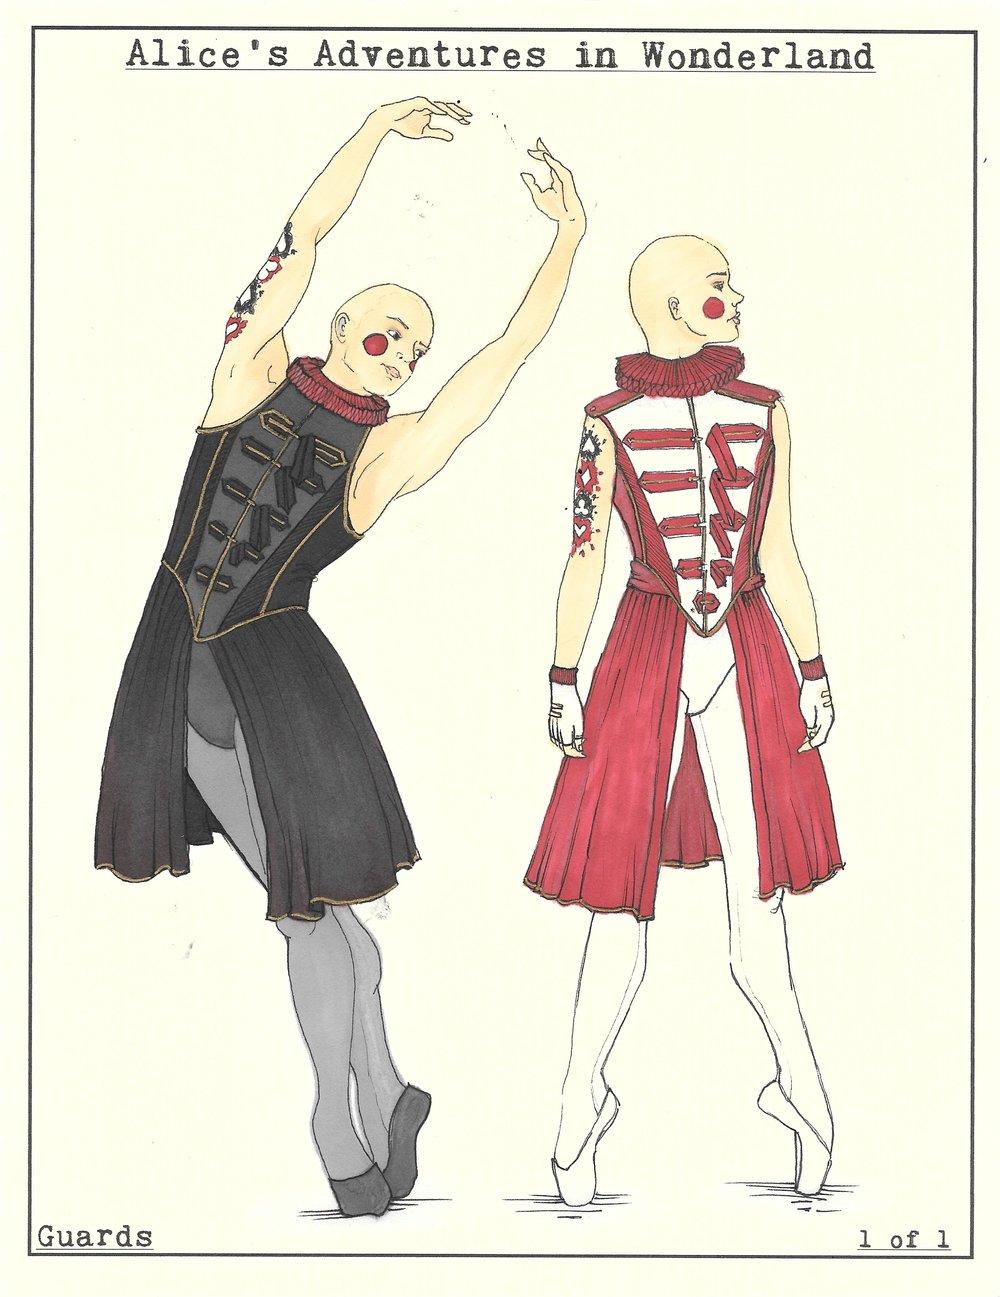 Guards. Wonderland